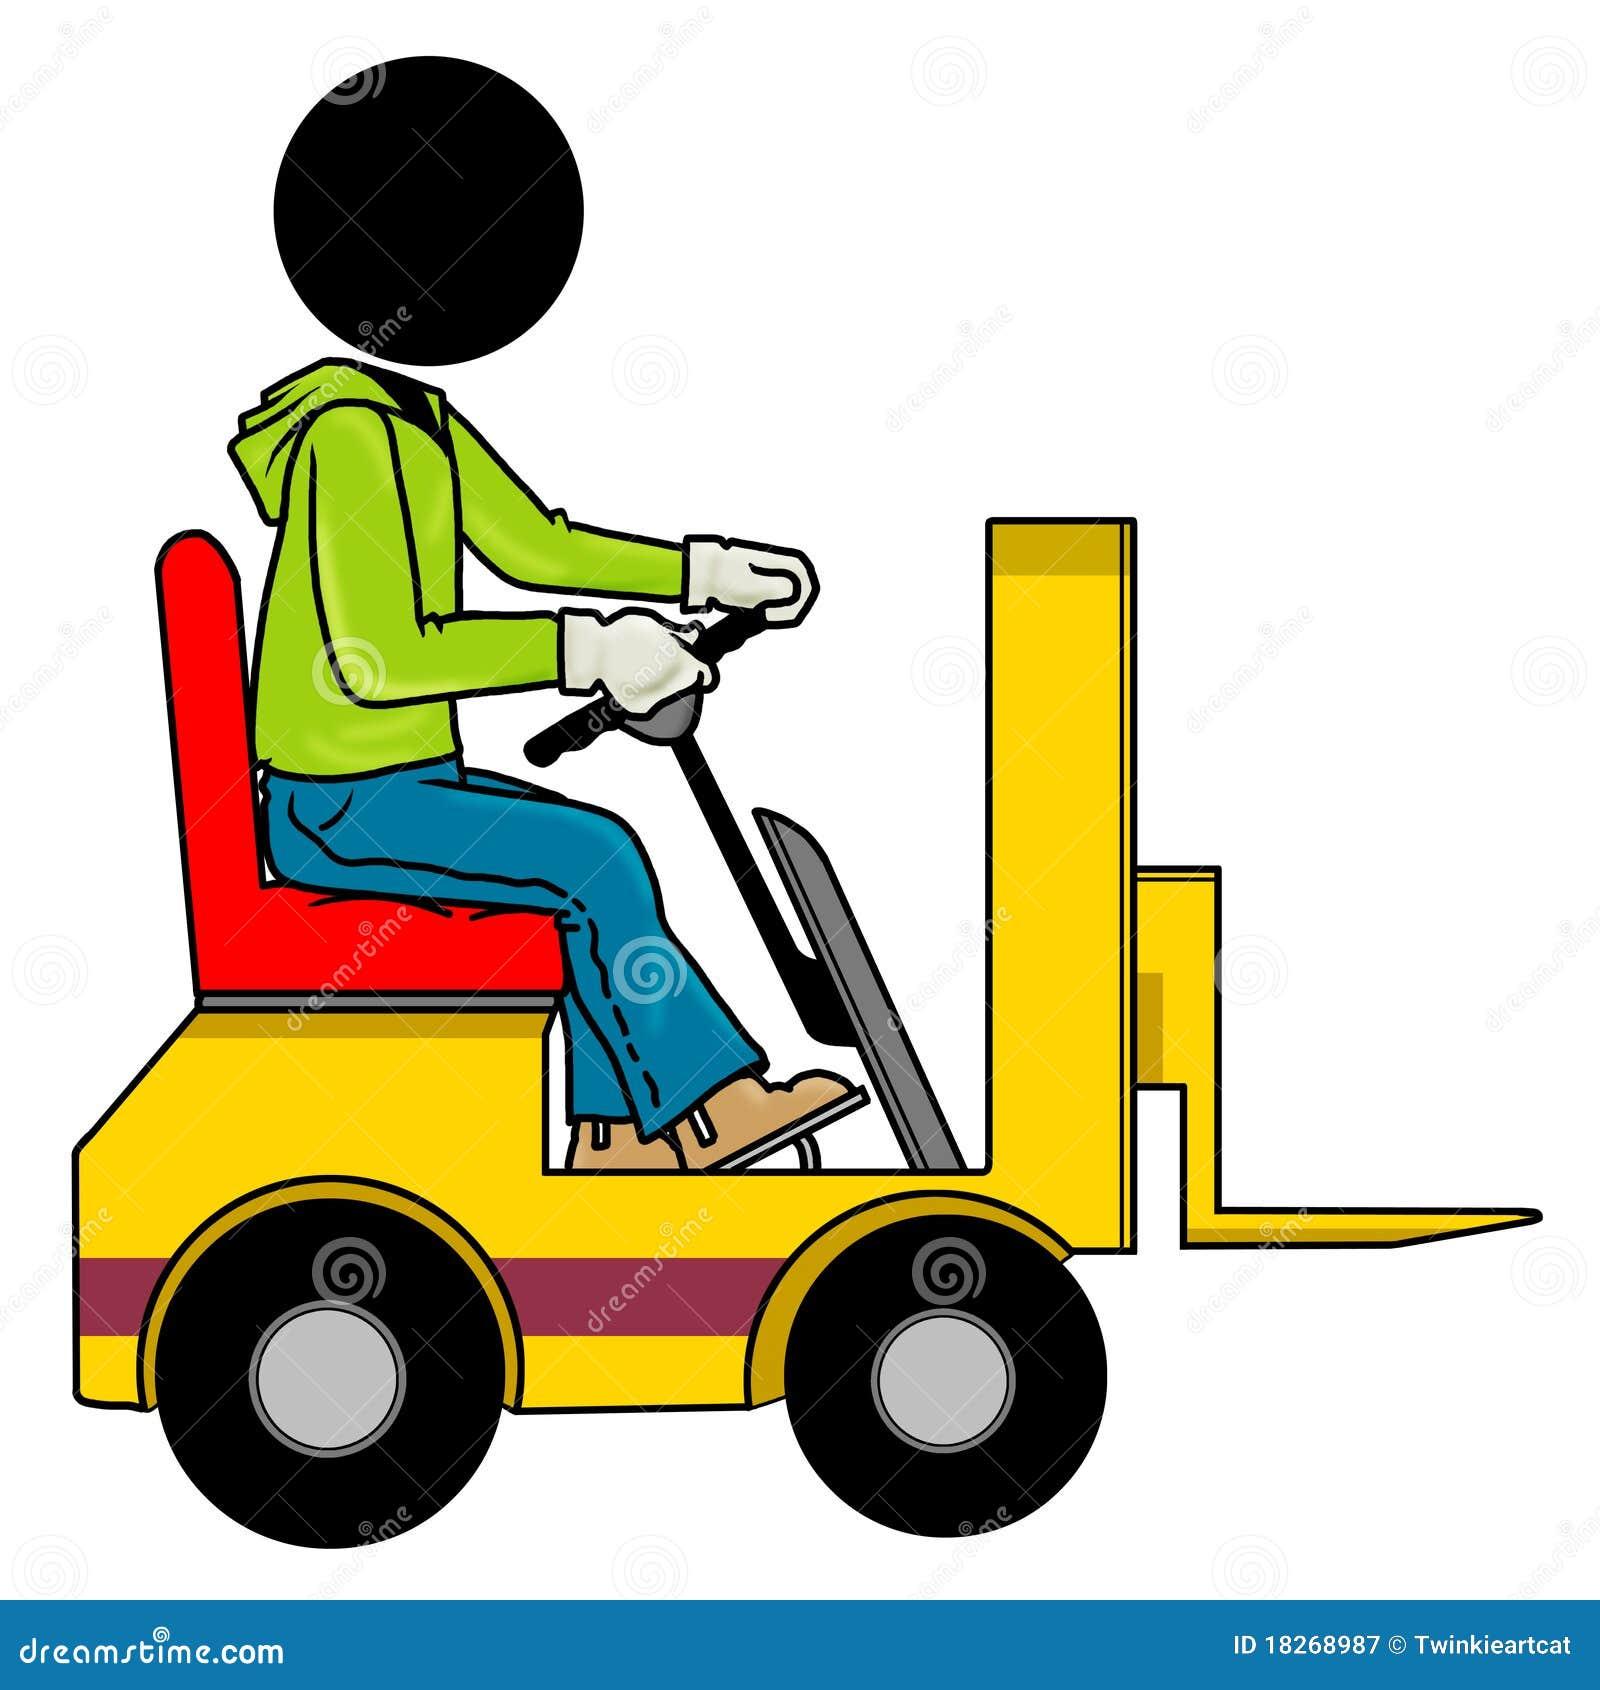 forklift-driver-18268987.jpg